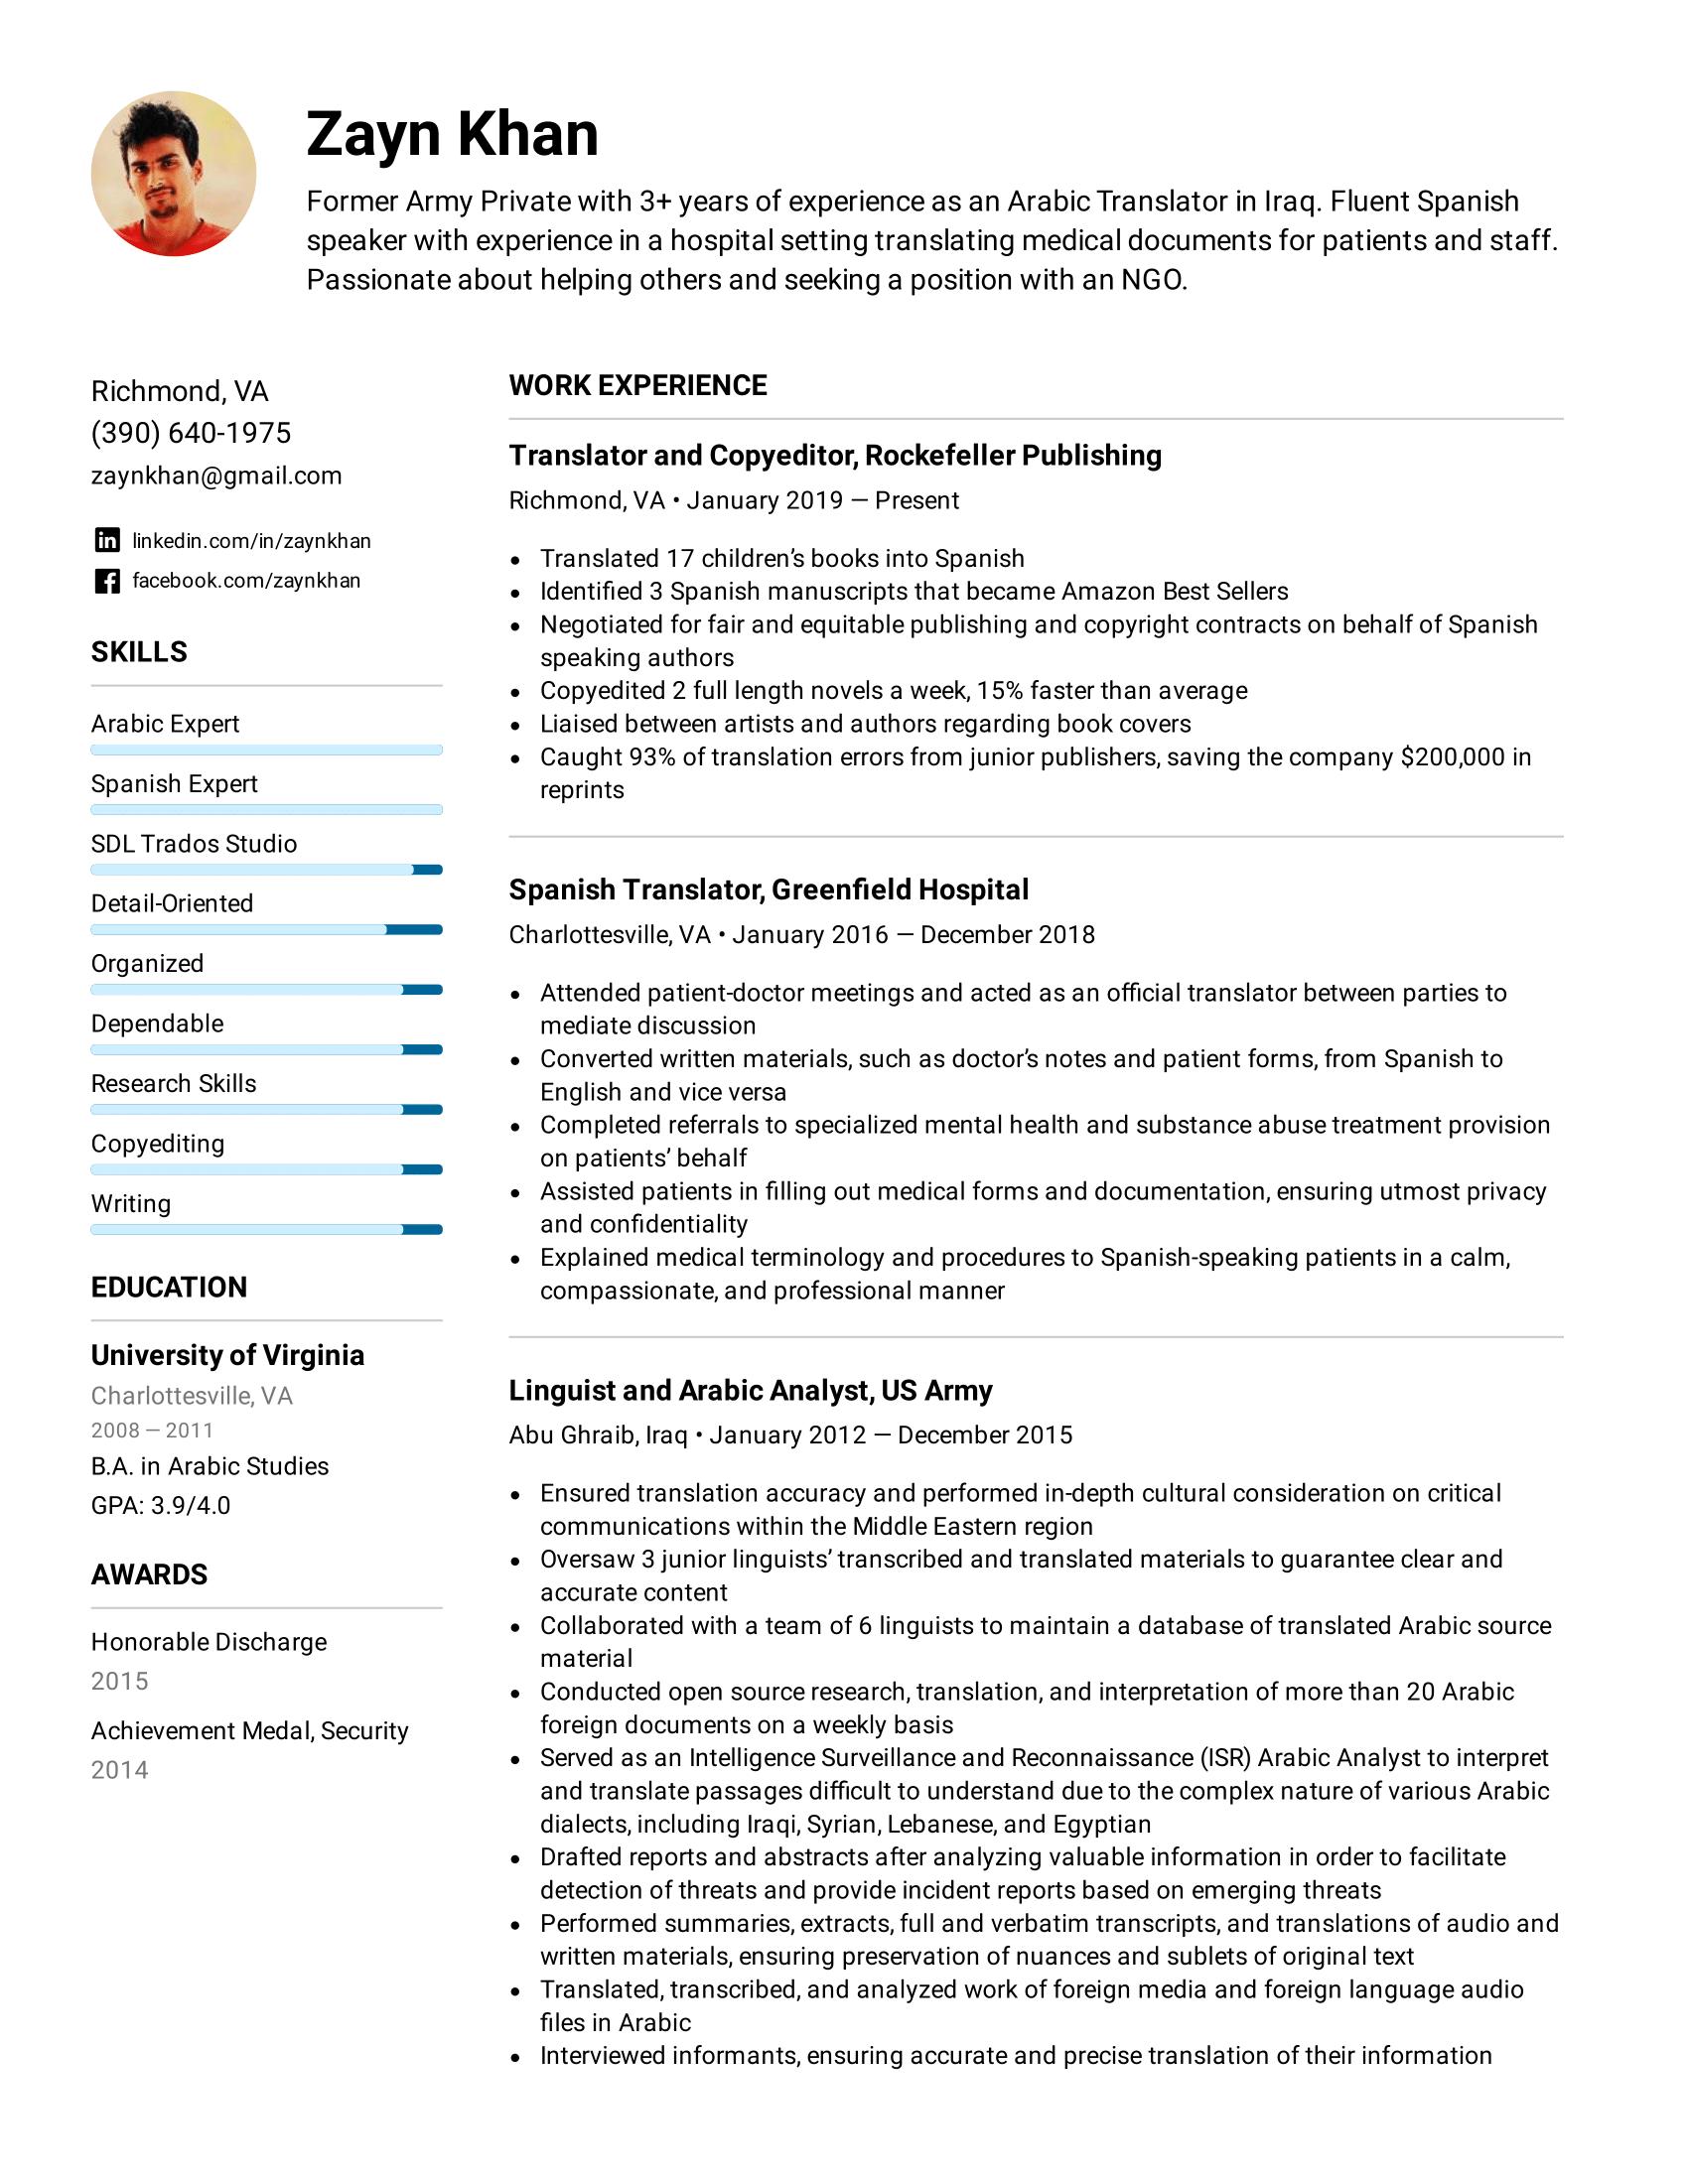 Translator Resume Example